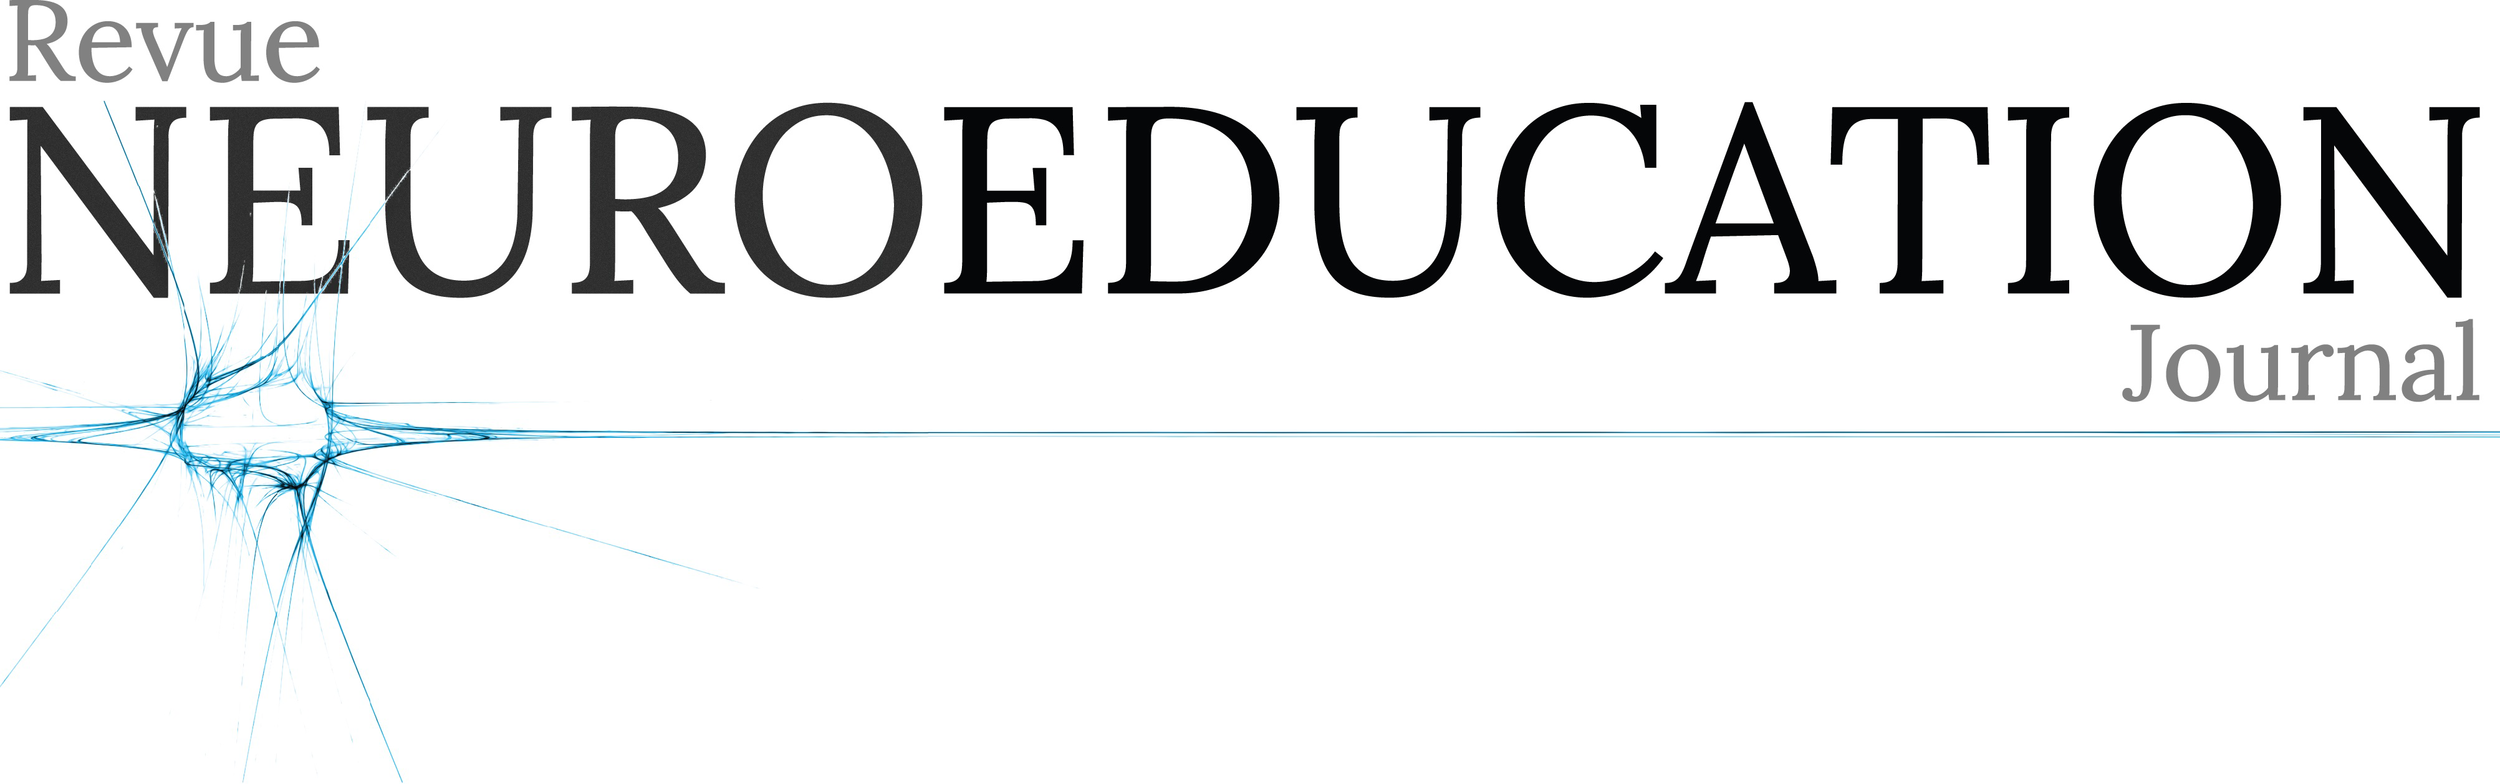 Logo_Neuroeducation_Journal.png